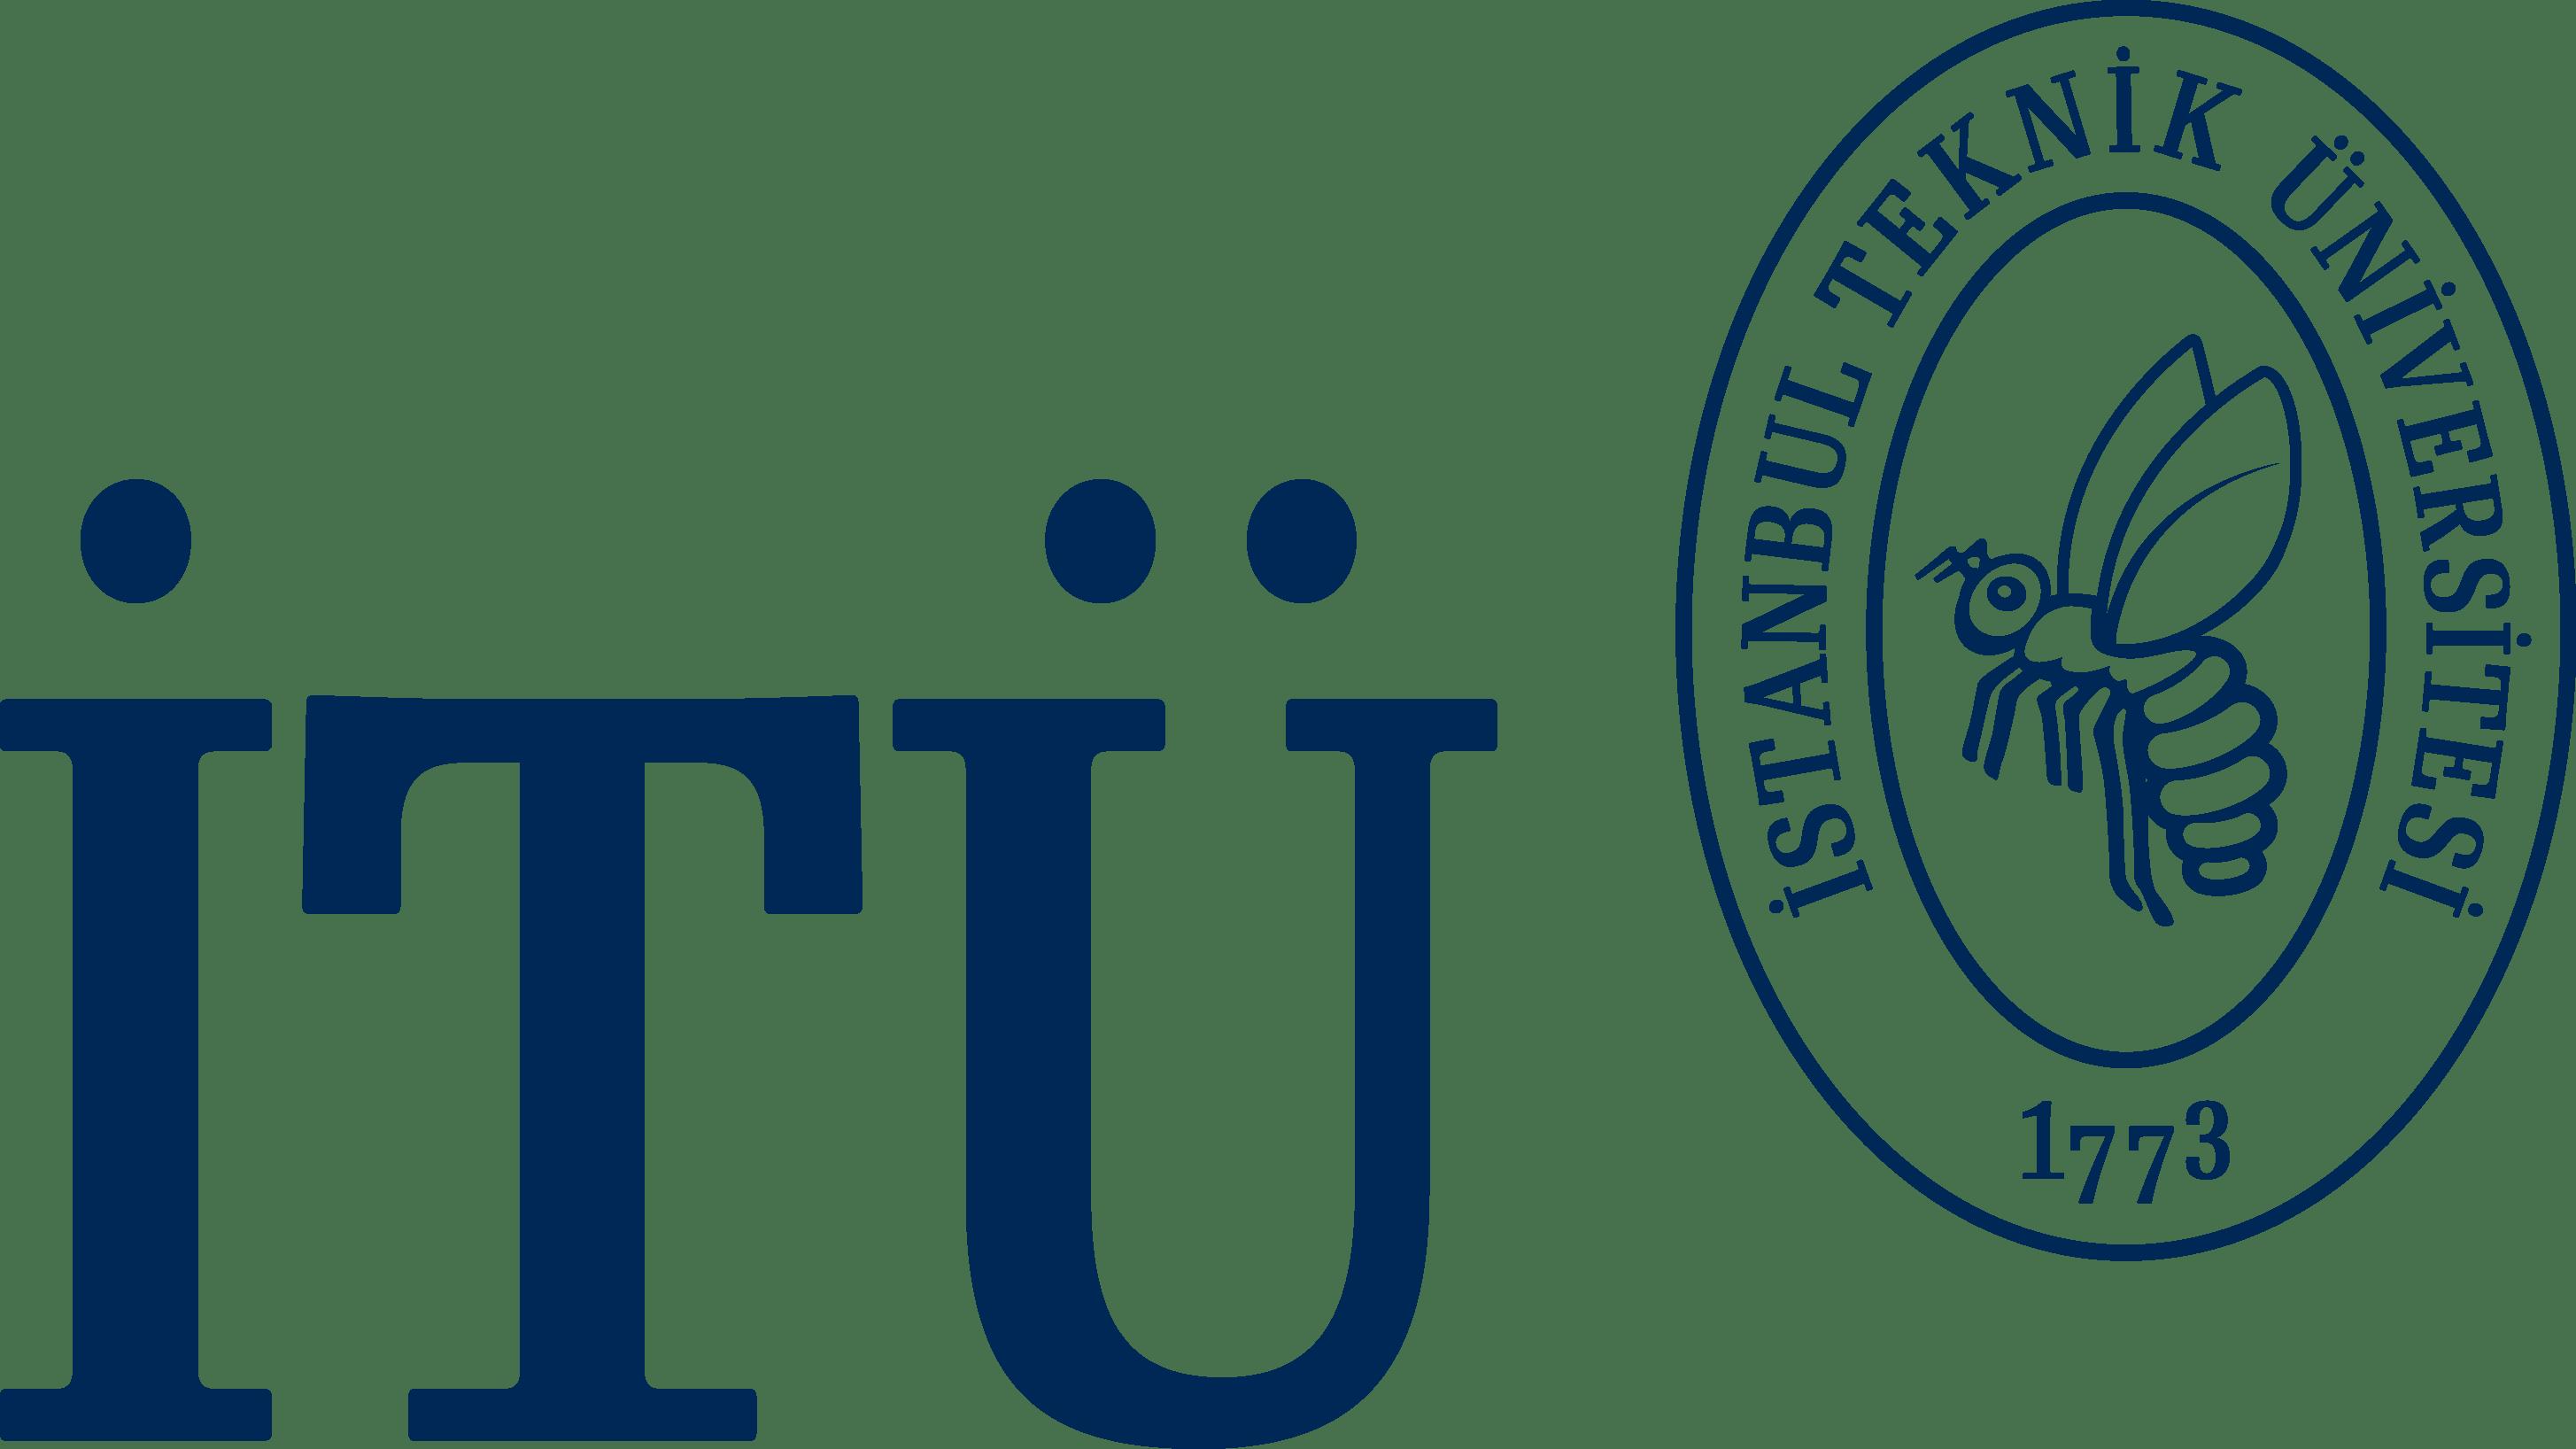 itu-istanbul_teknik_universitesi_logo